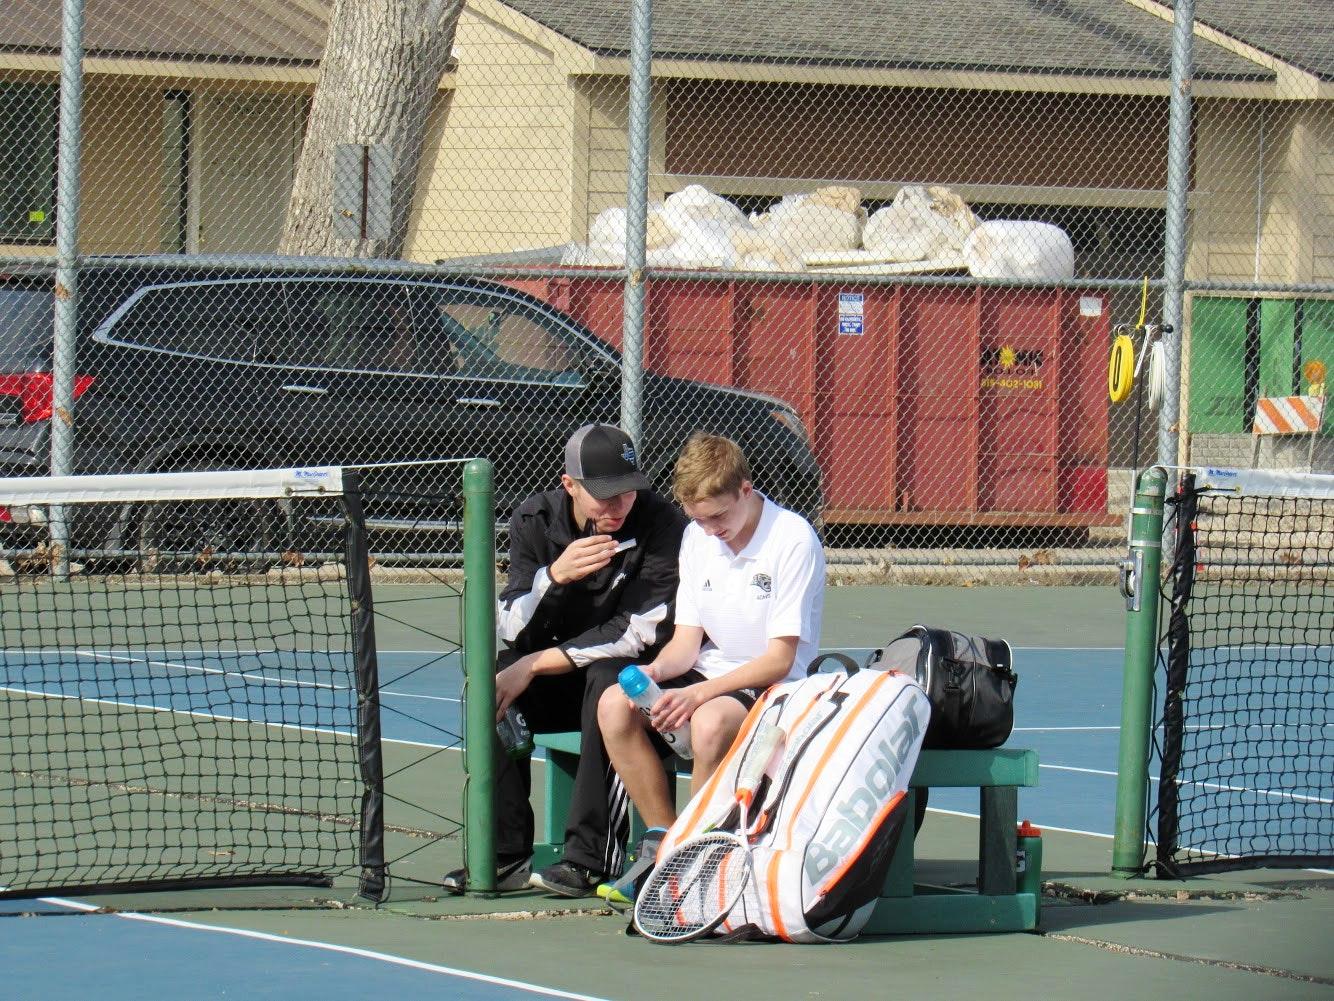 Grant T. teaches tennis lessons in Dallas, TX